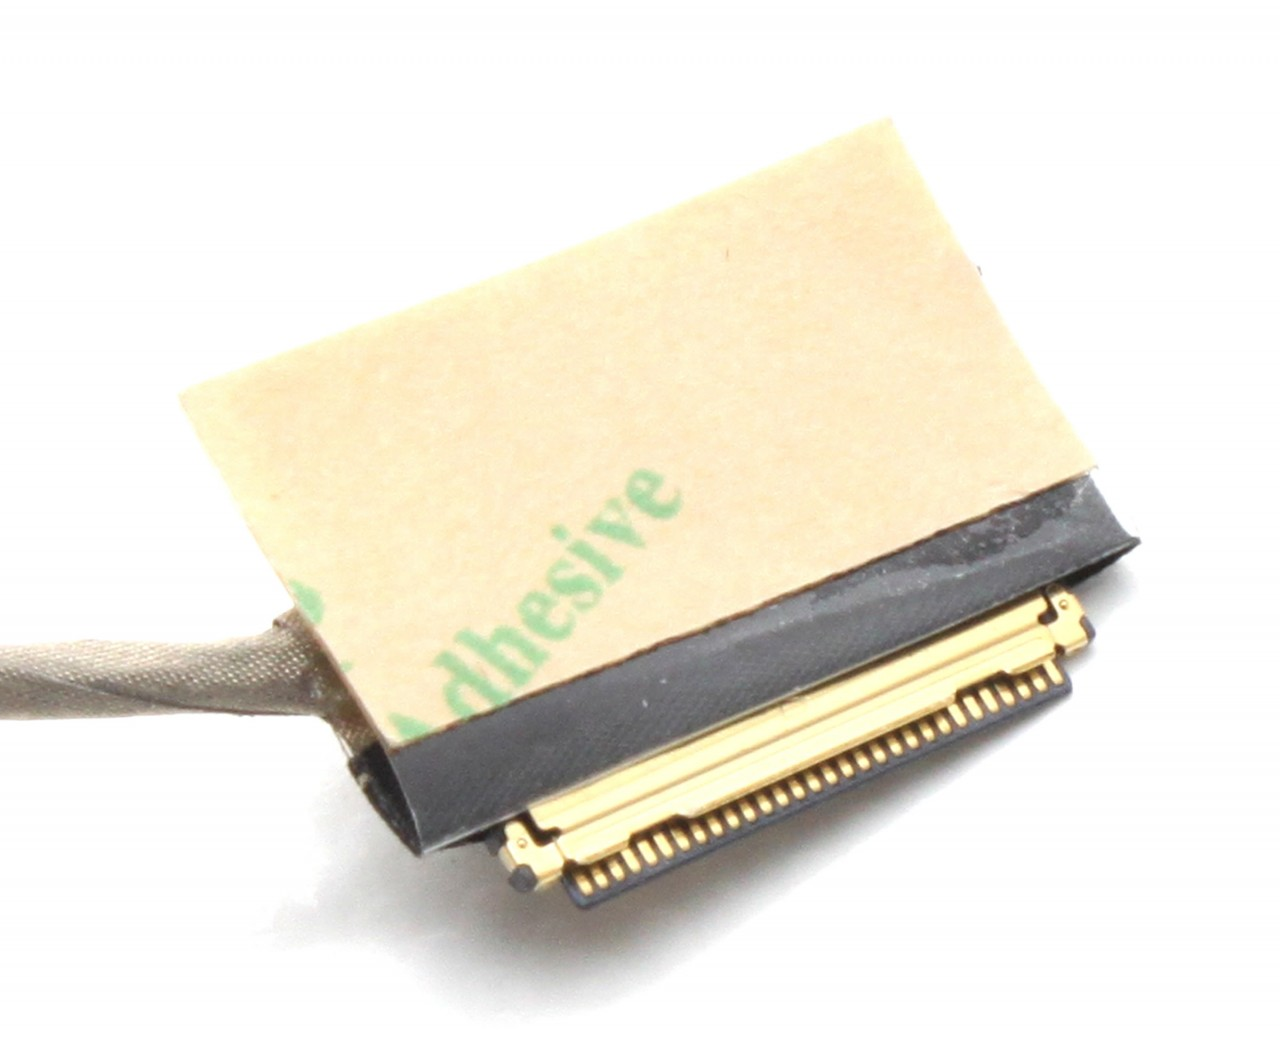 Cablu video eDP Lenovo DC02001W020 imagine powerlaptop.ro 2021